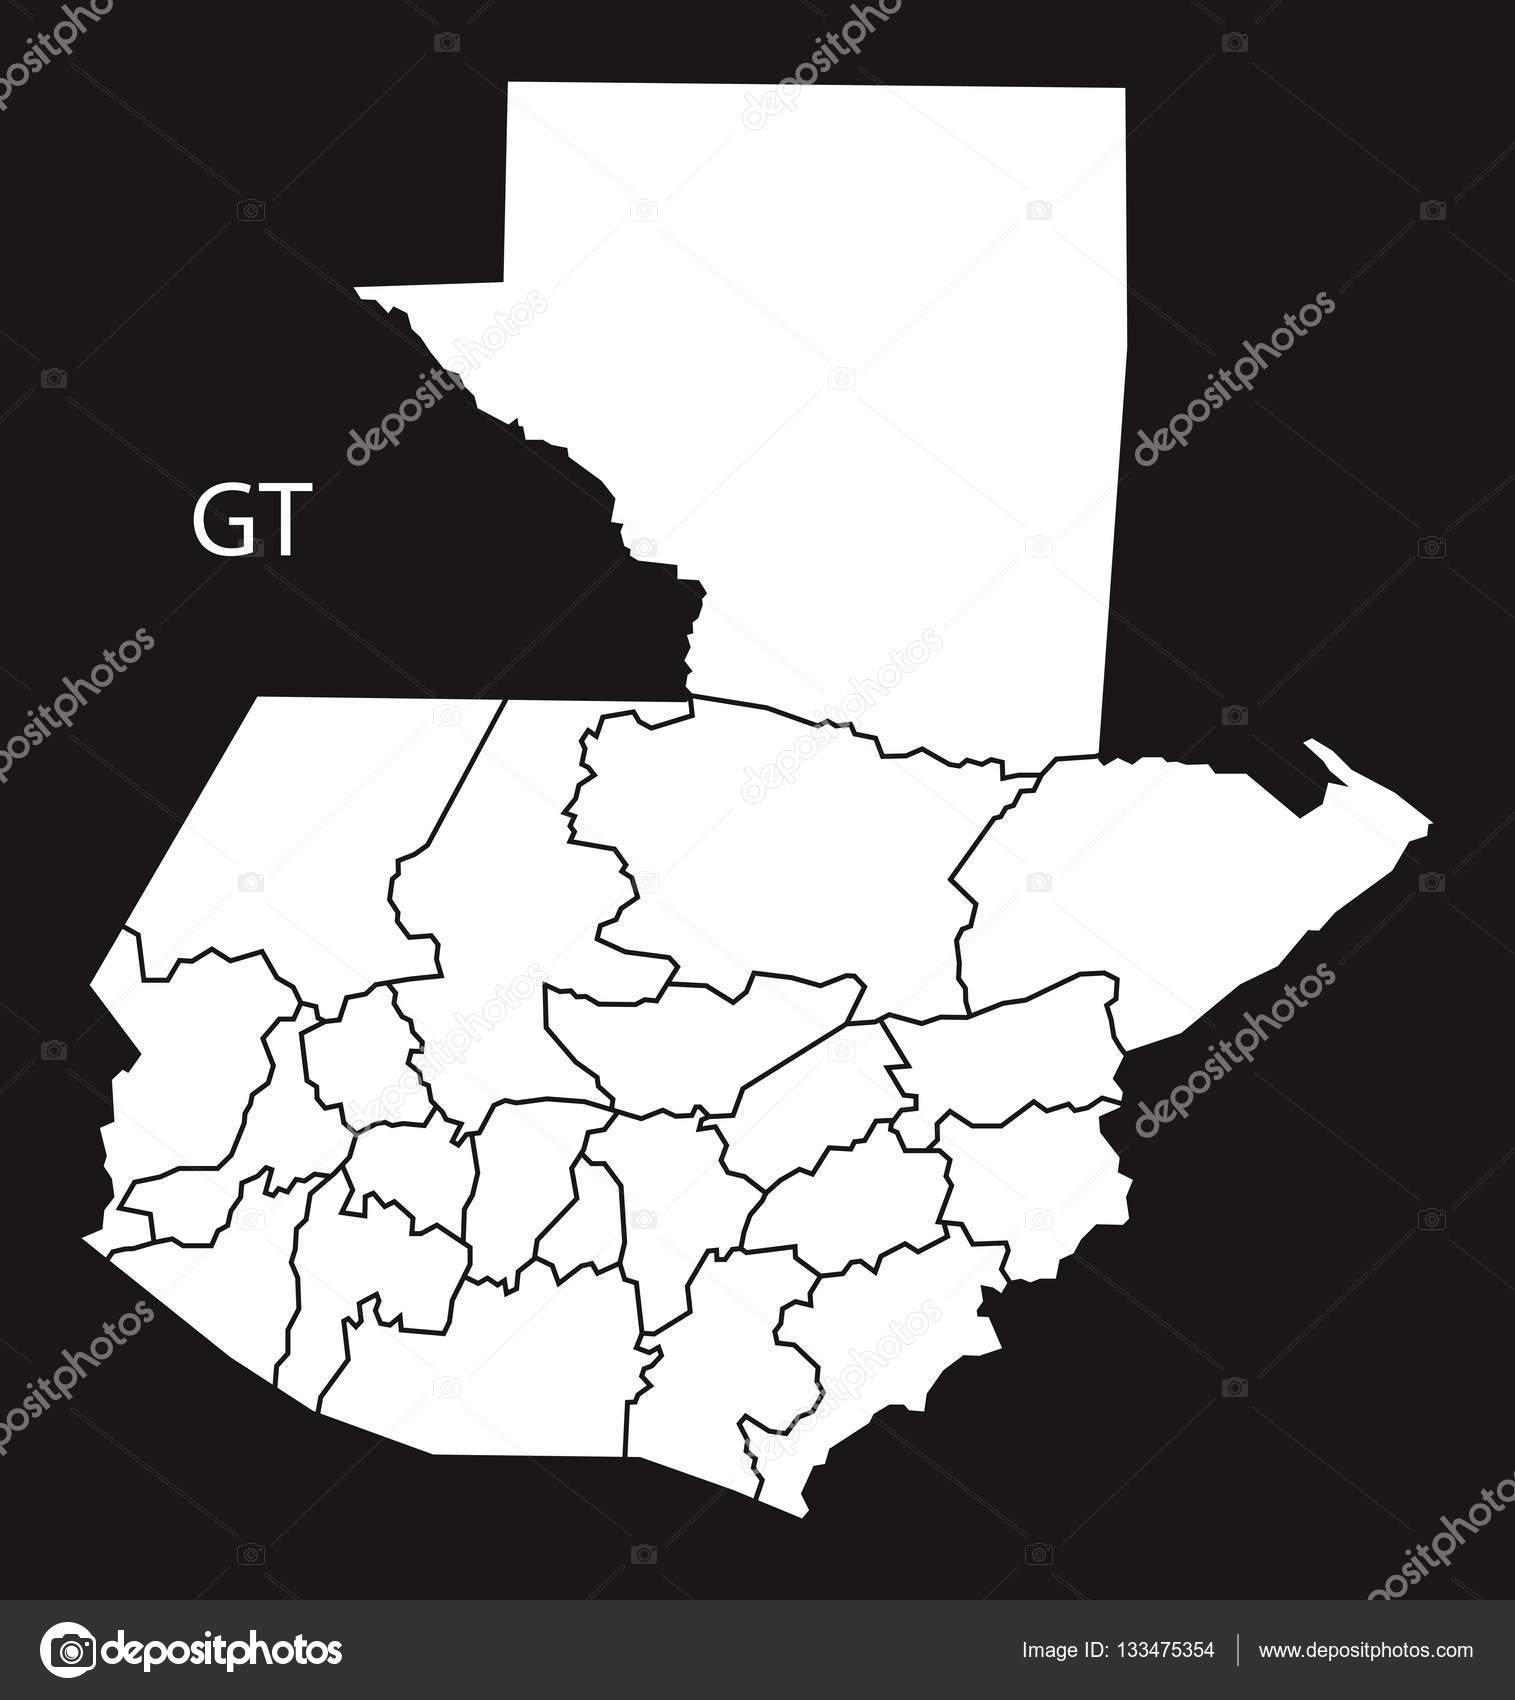 Guatemala departments Map black country — Stock Vector © ingomenhard on